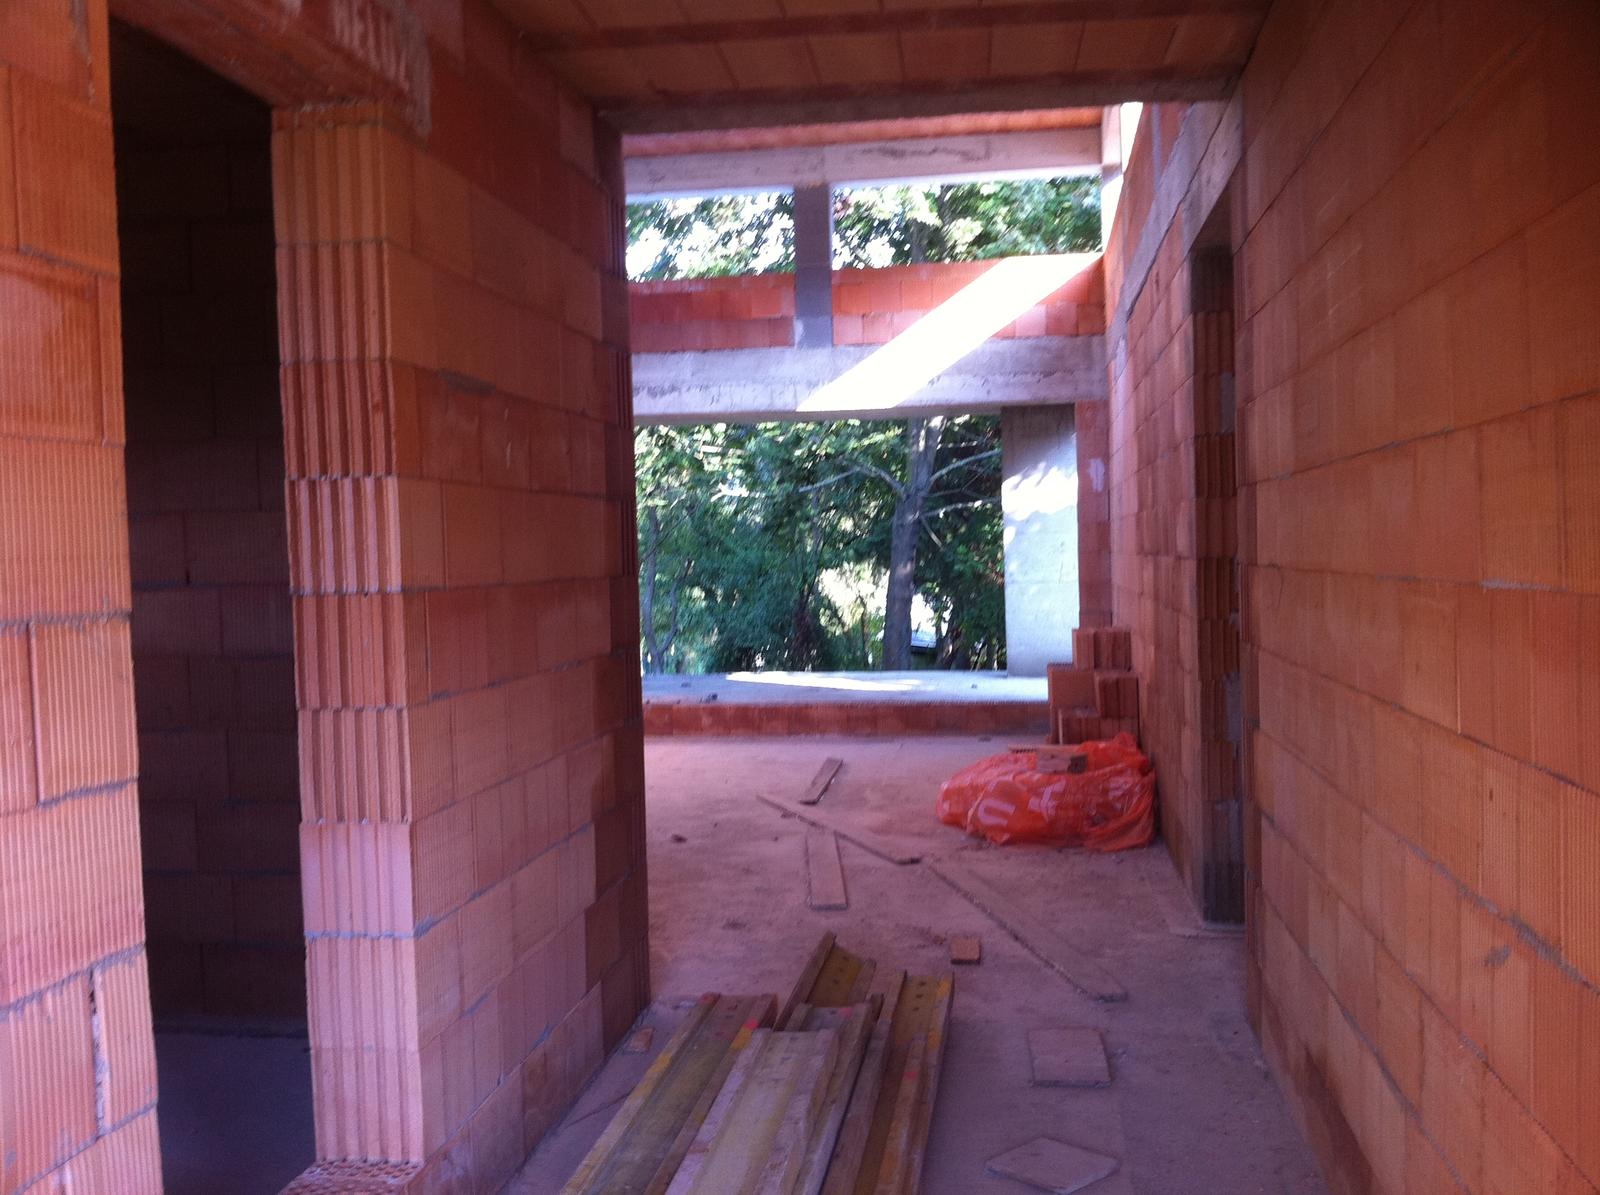 Zaciname... - Pohlad z vchodu cez obyvacku na terasu a zahradu